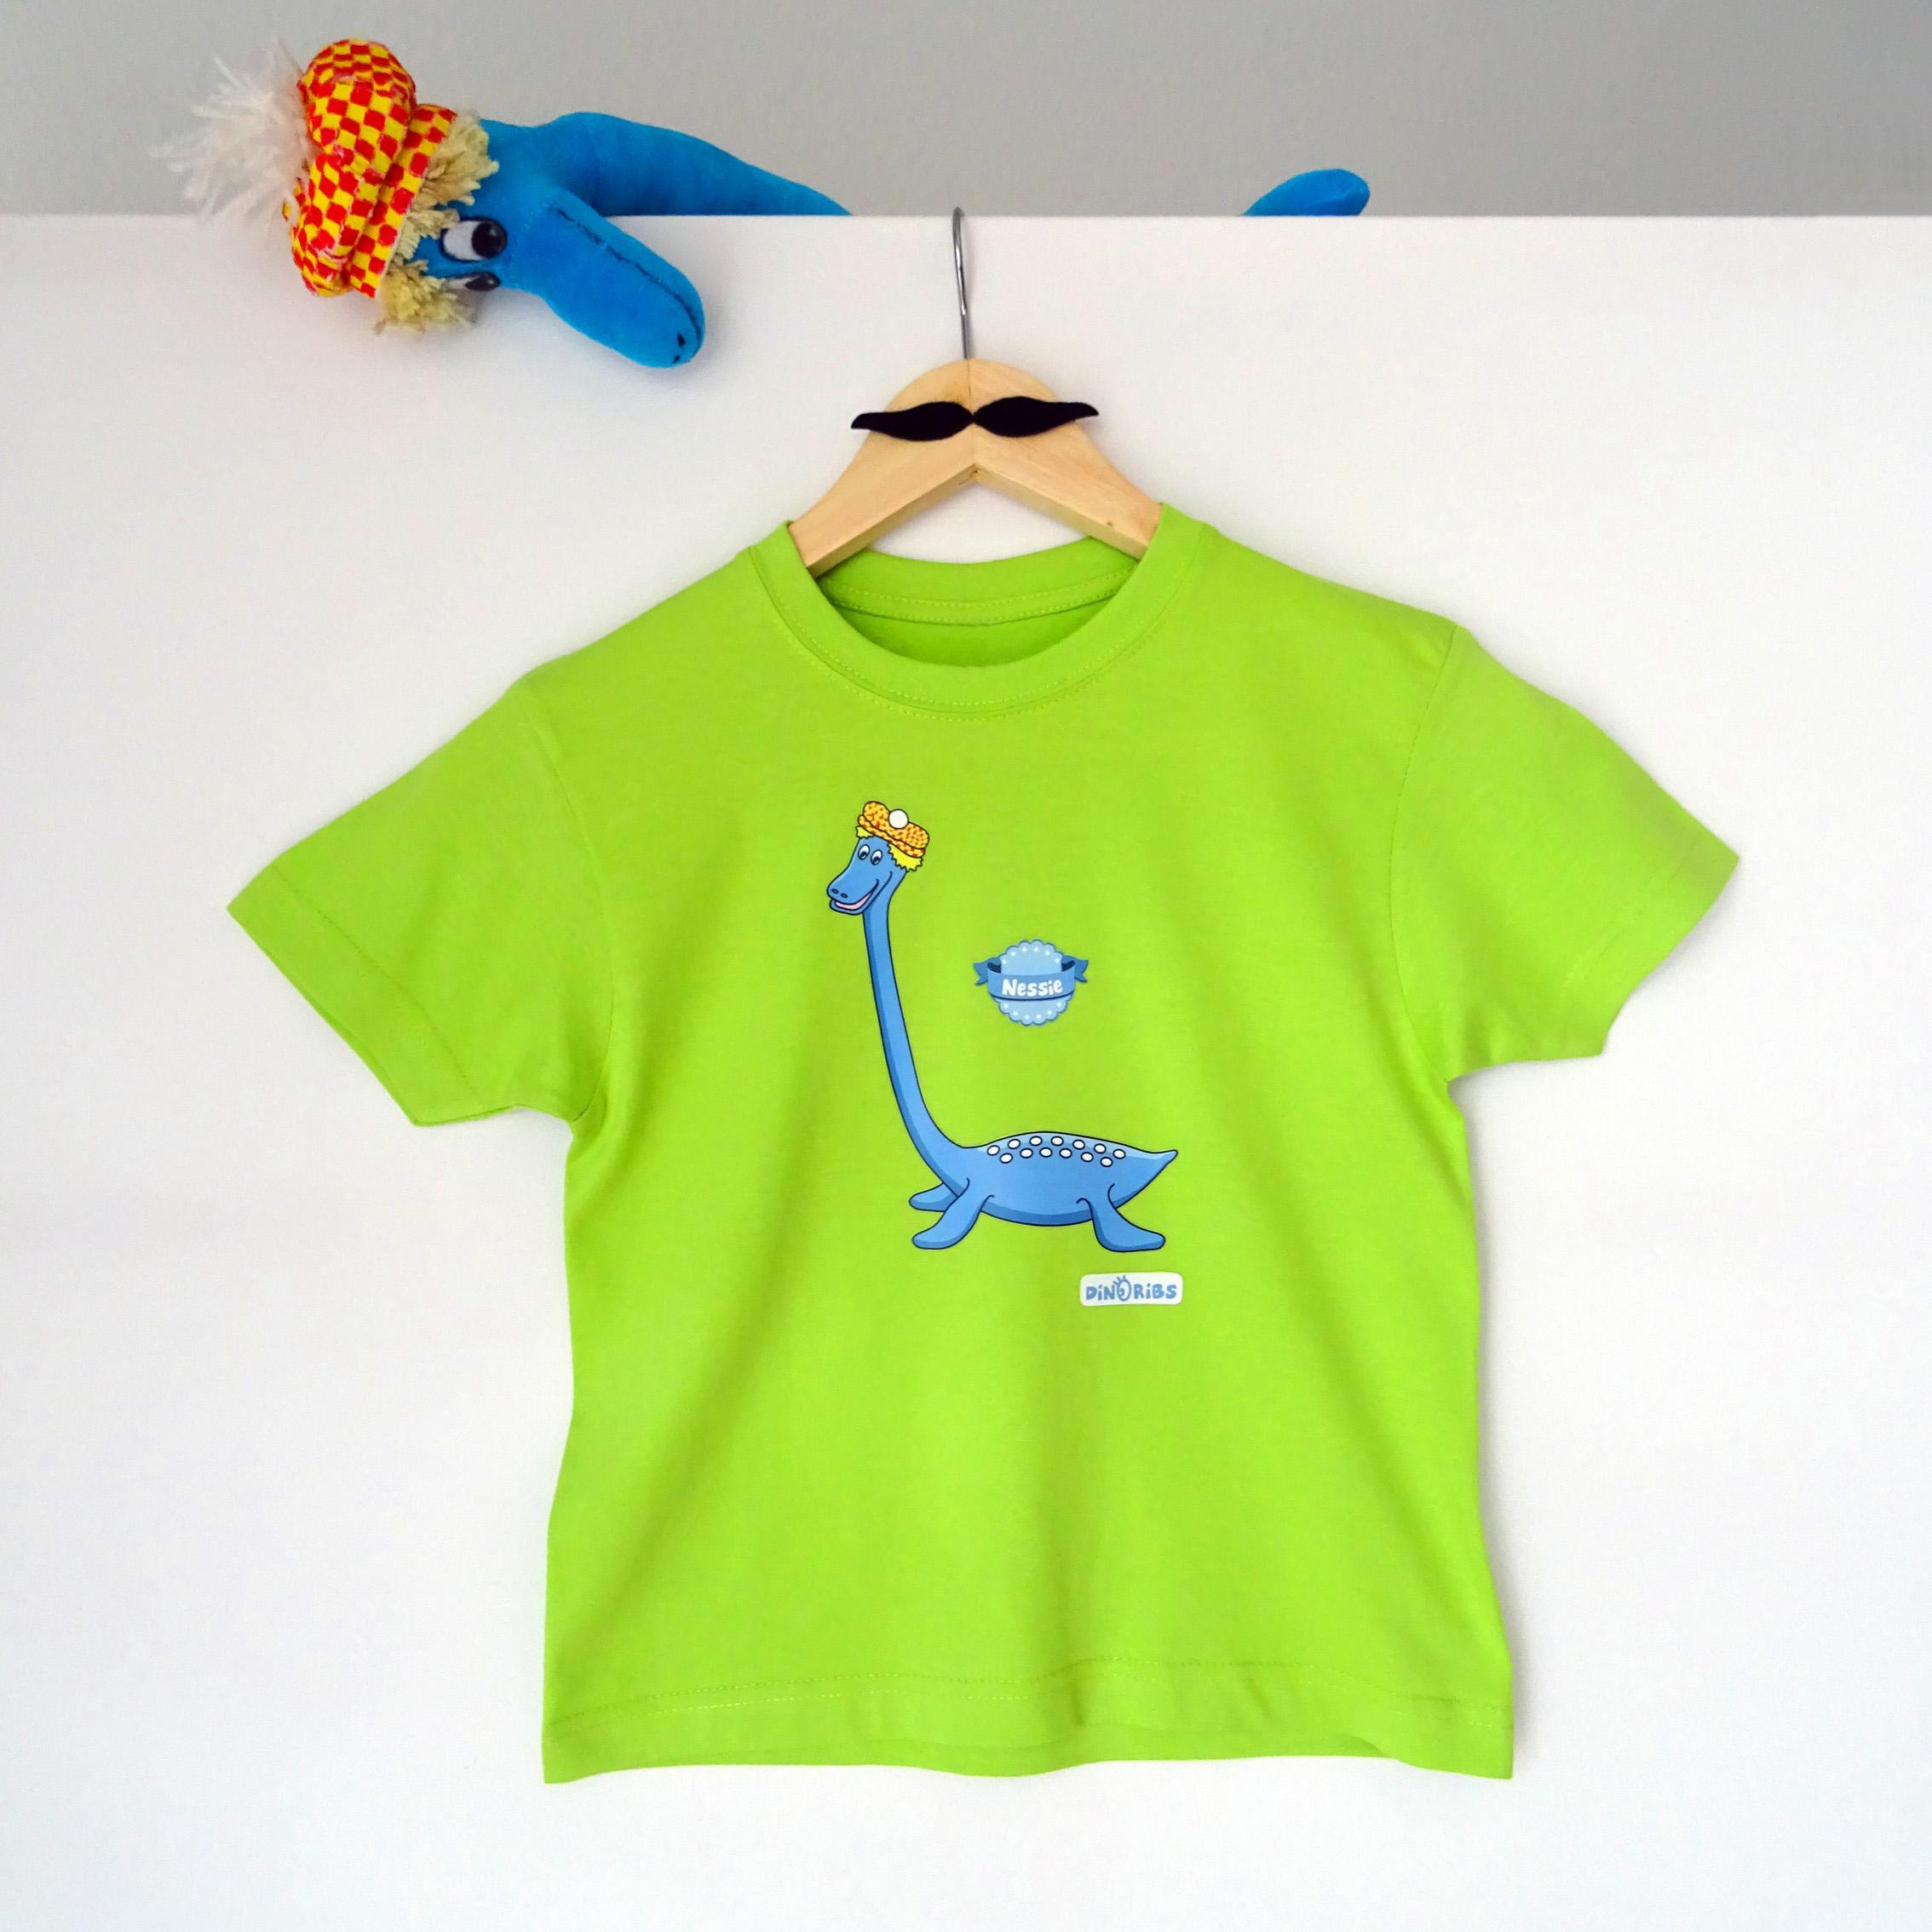 Tee-shirt Nessie made by Dinoribs